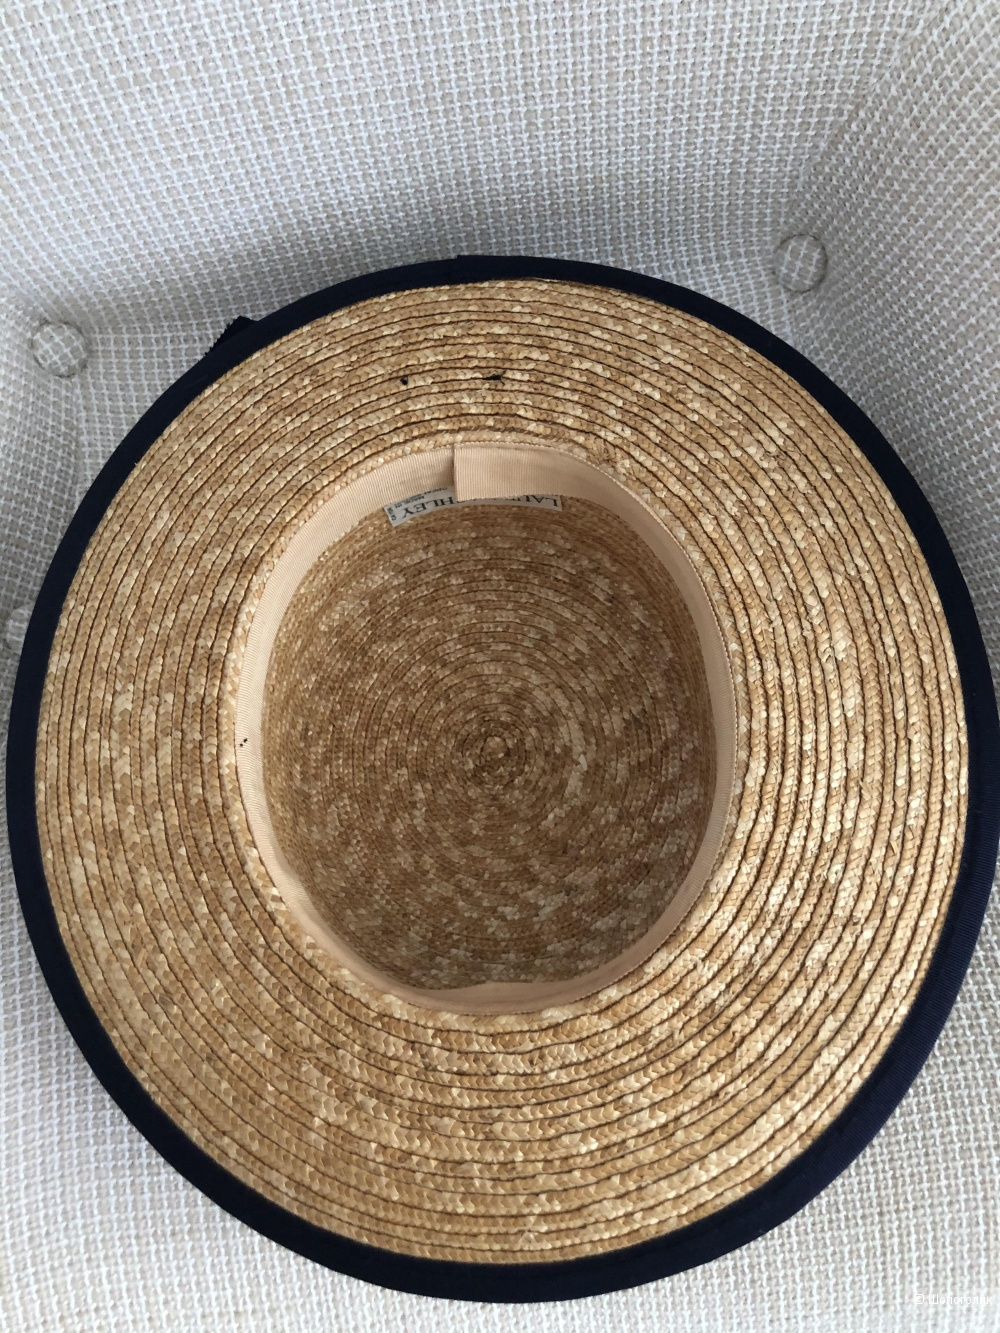 Шляпа-конотье Laura Ashley.